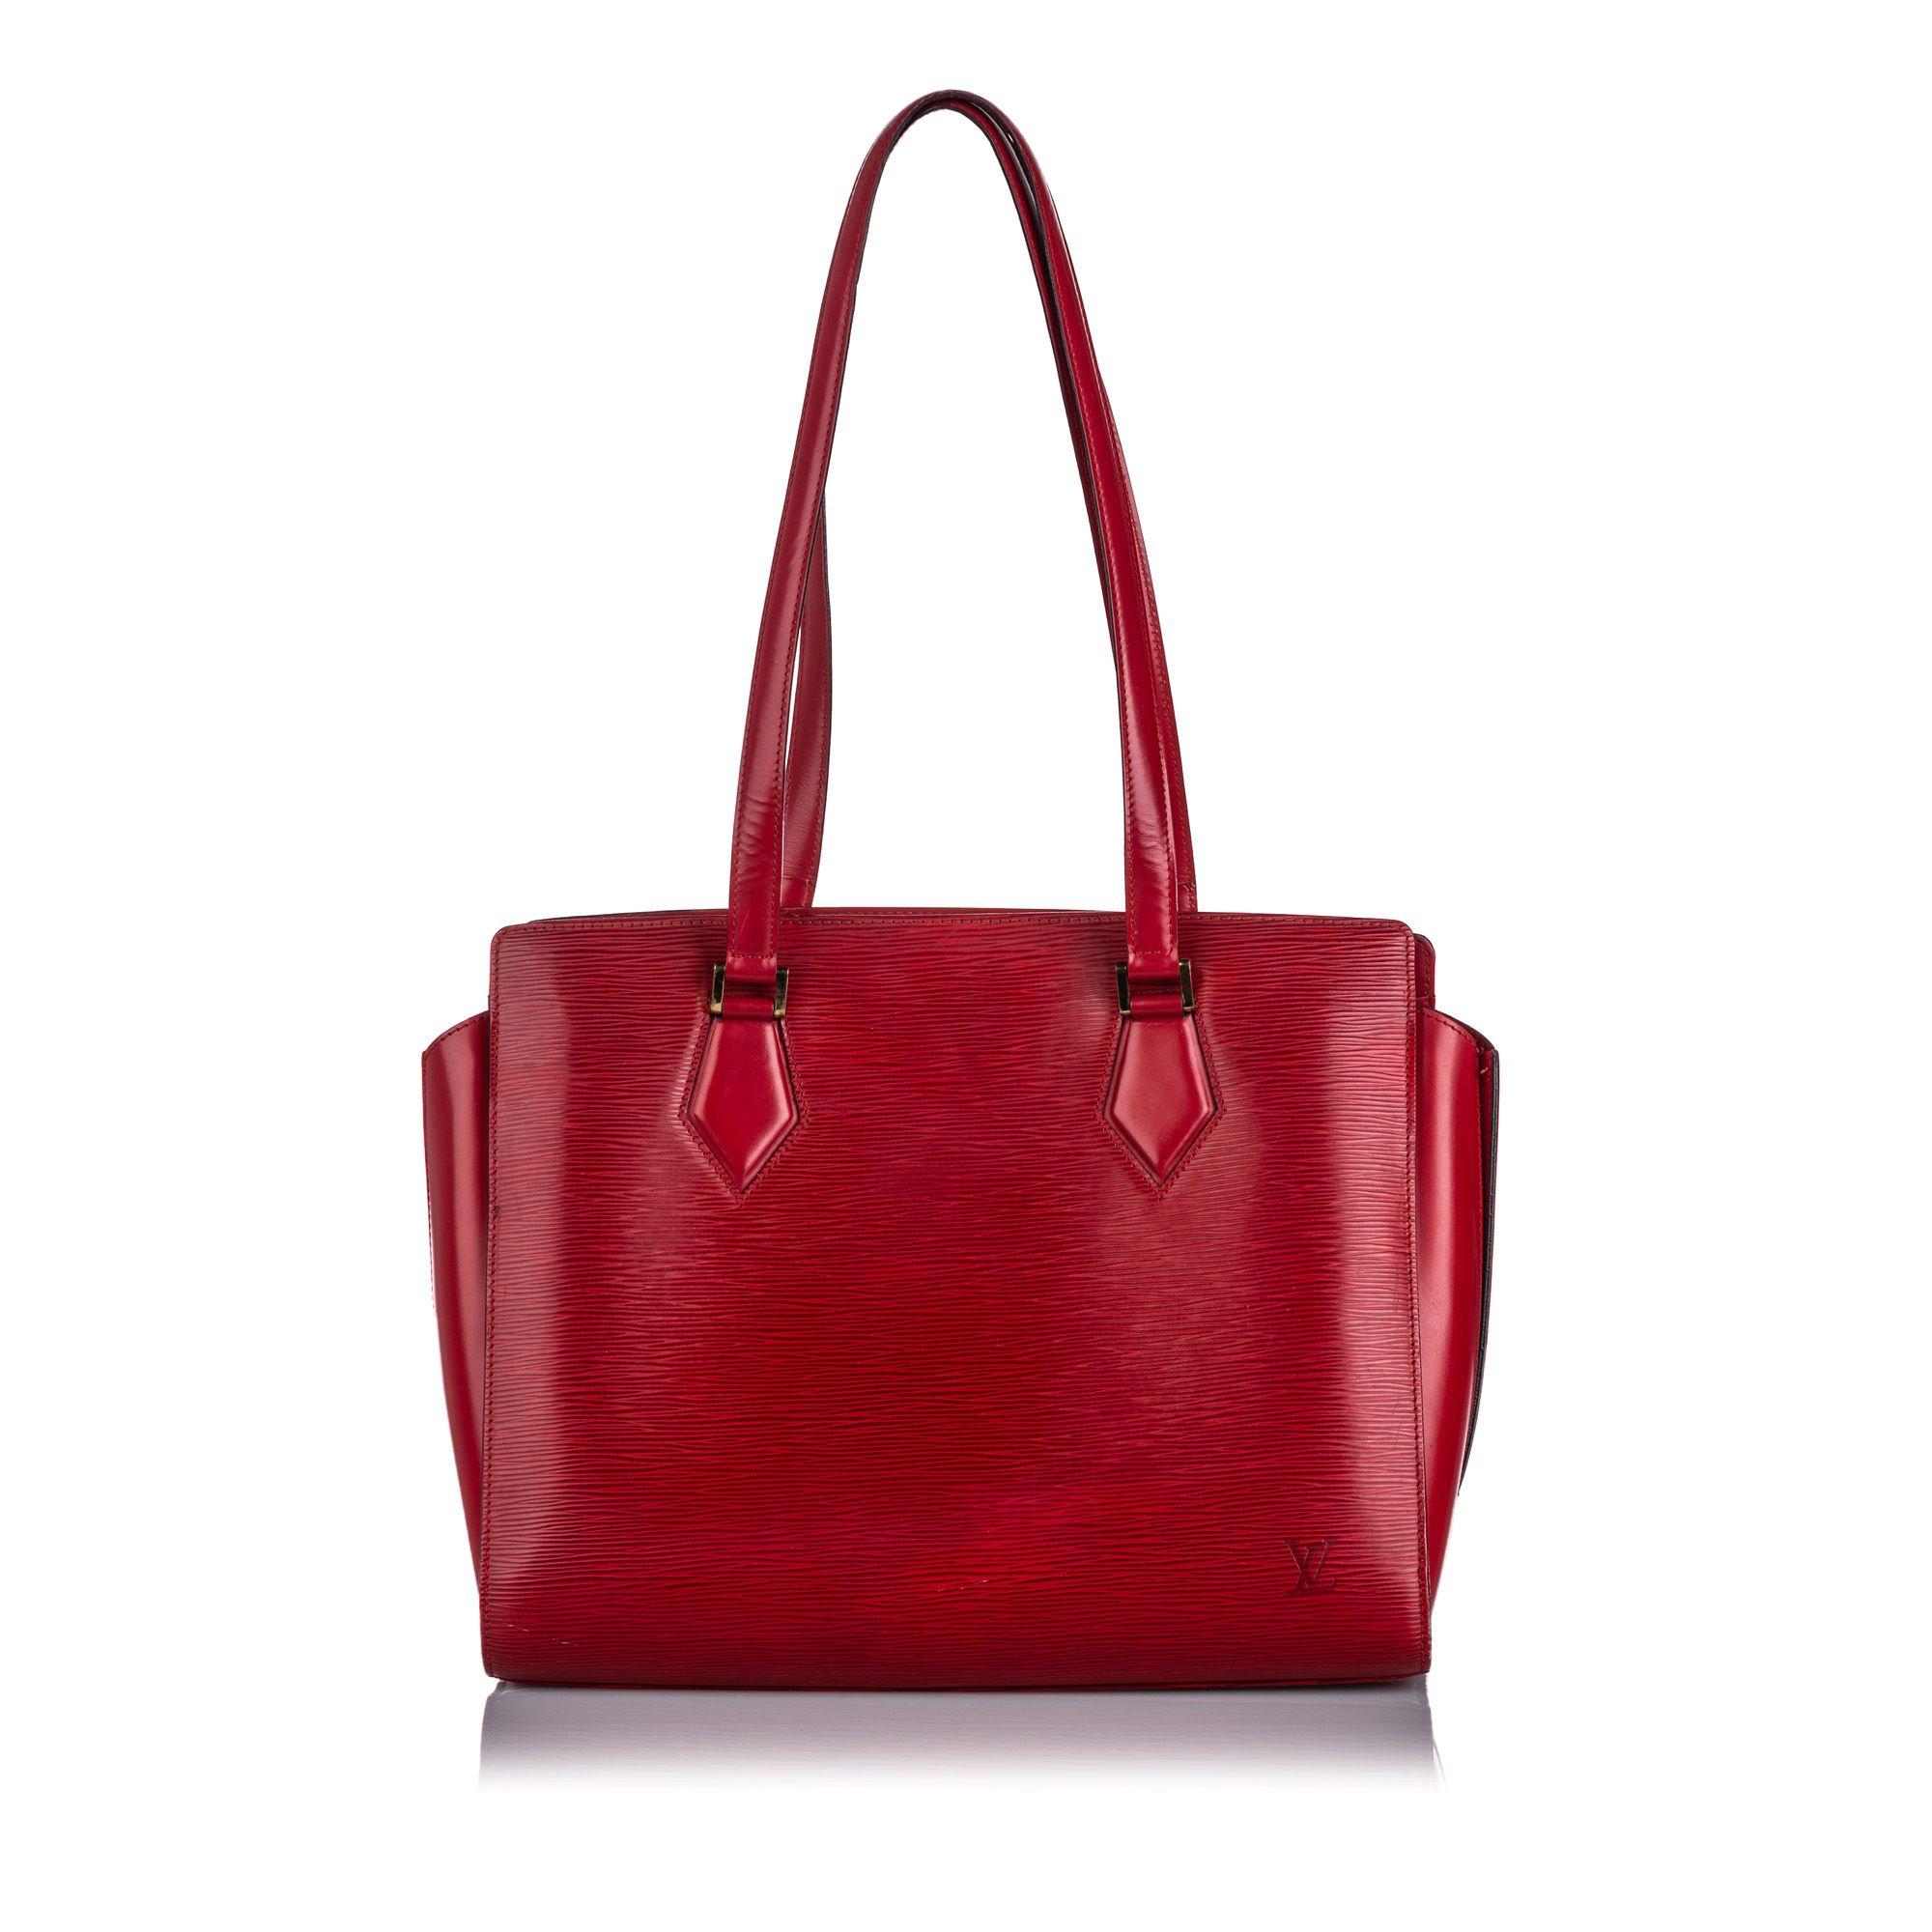 Vintage Louis Vuitton Epi Duplex Red